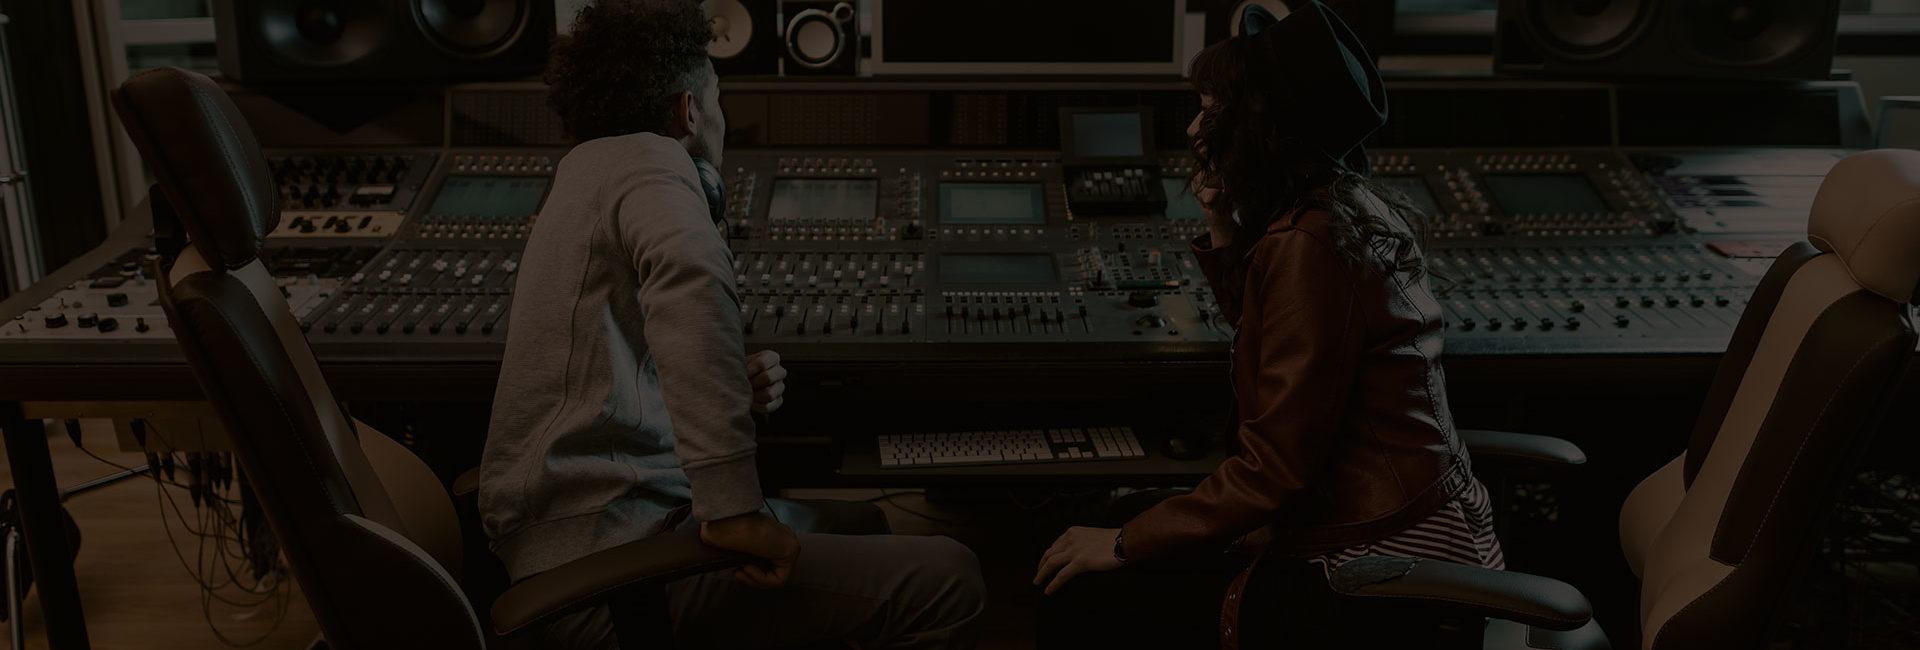 studio-bg_01